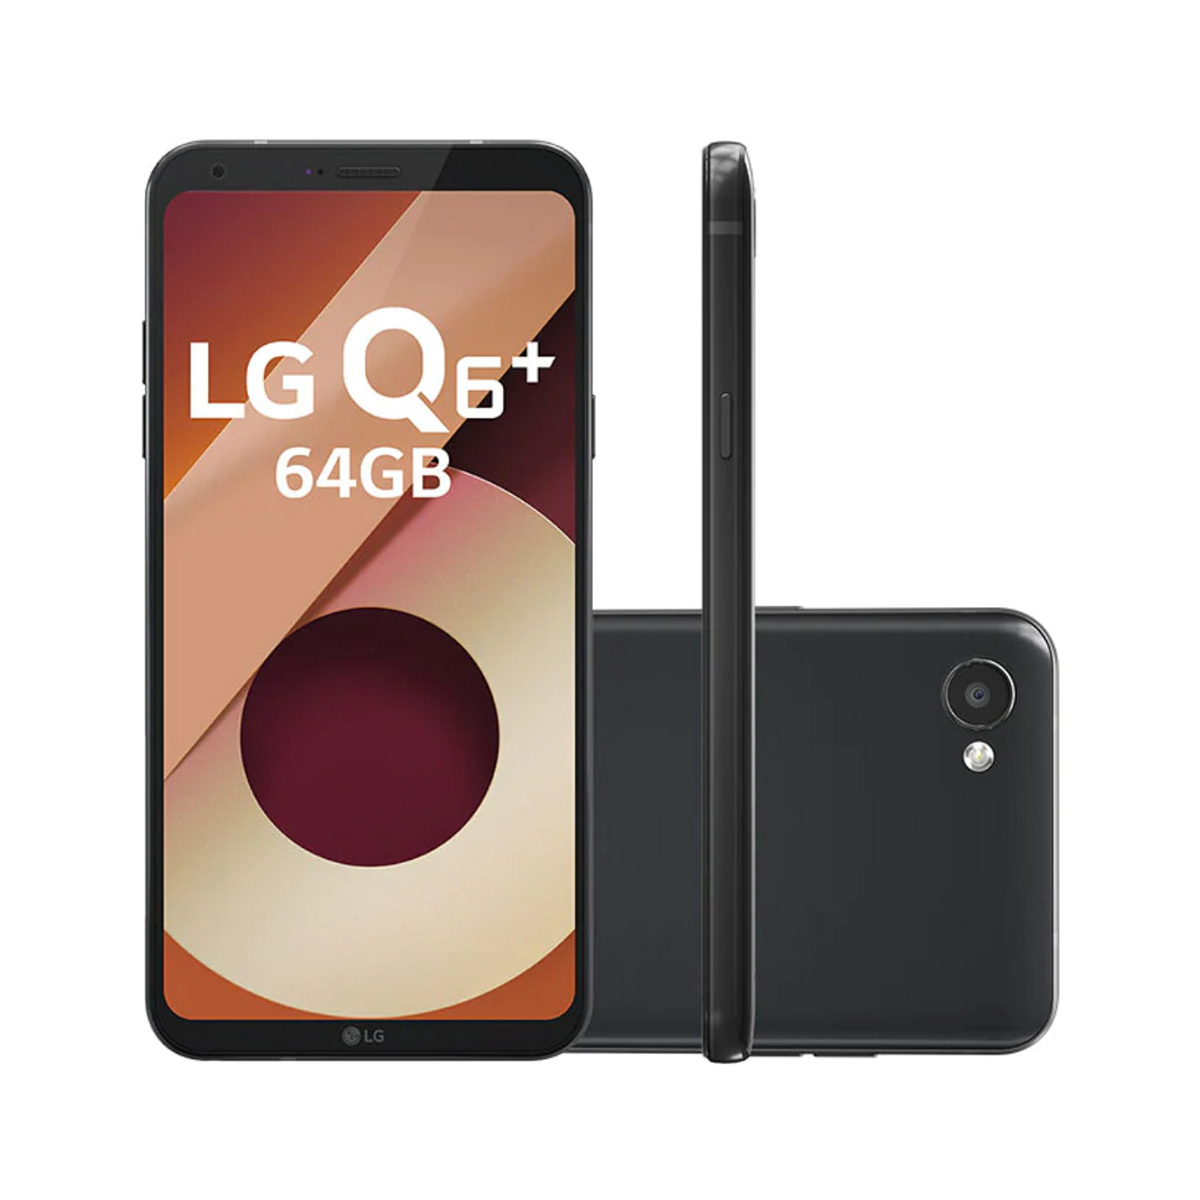 Smartphone LG Q6 Plus M700tv 64gb Dual Tela 5.5' Mostruário